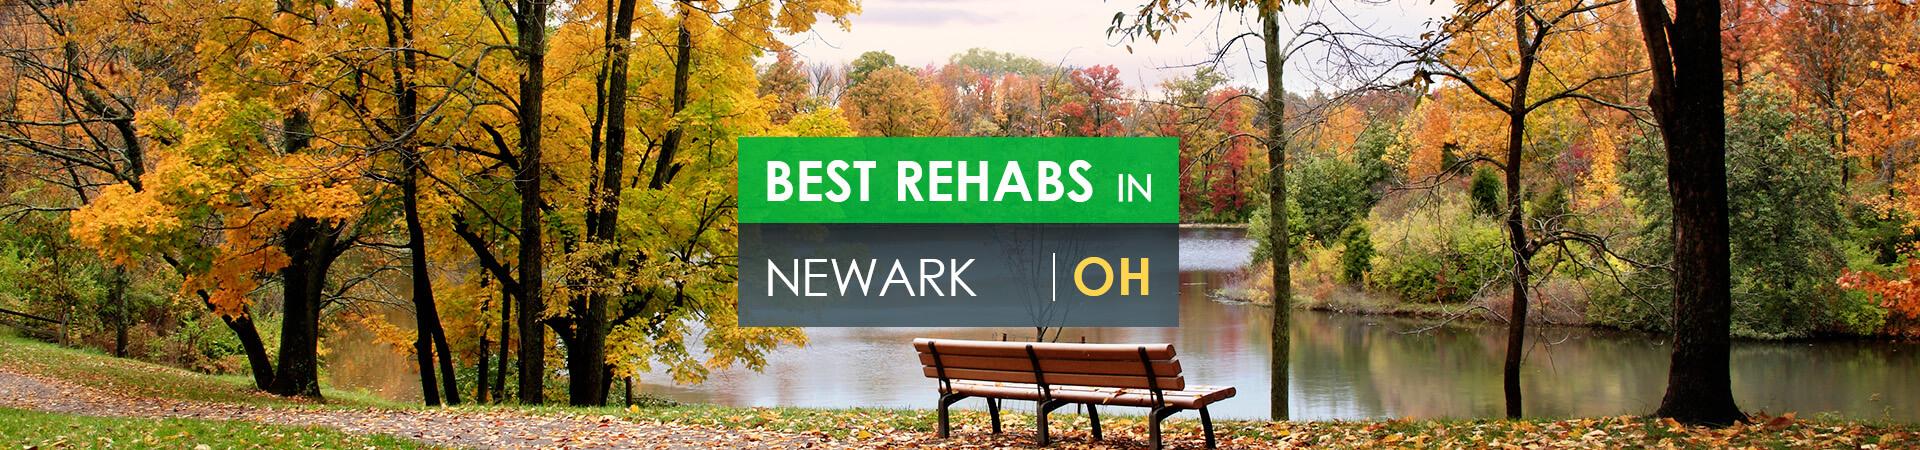 Best rehabs in Newark, OH